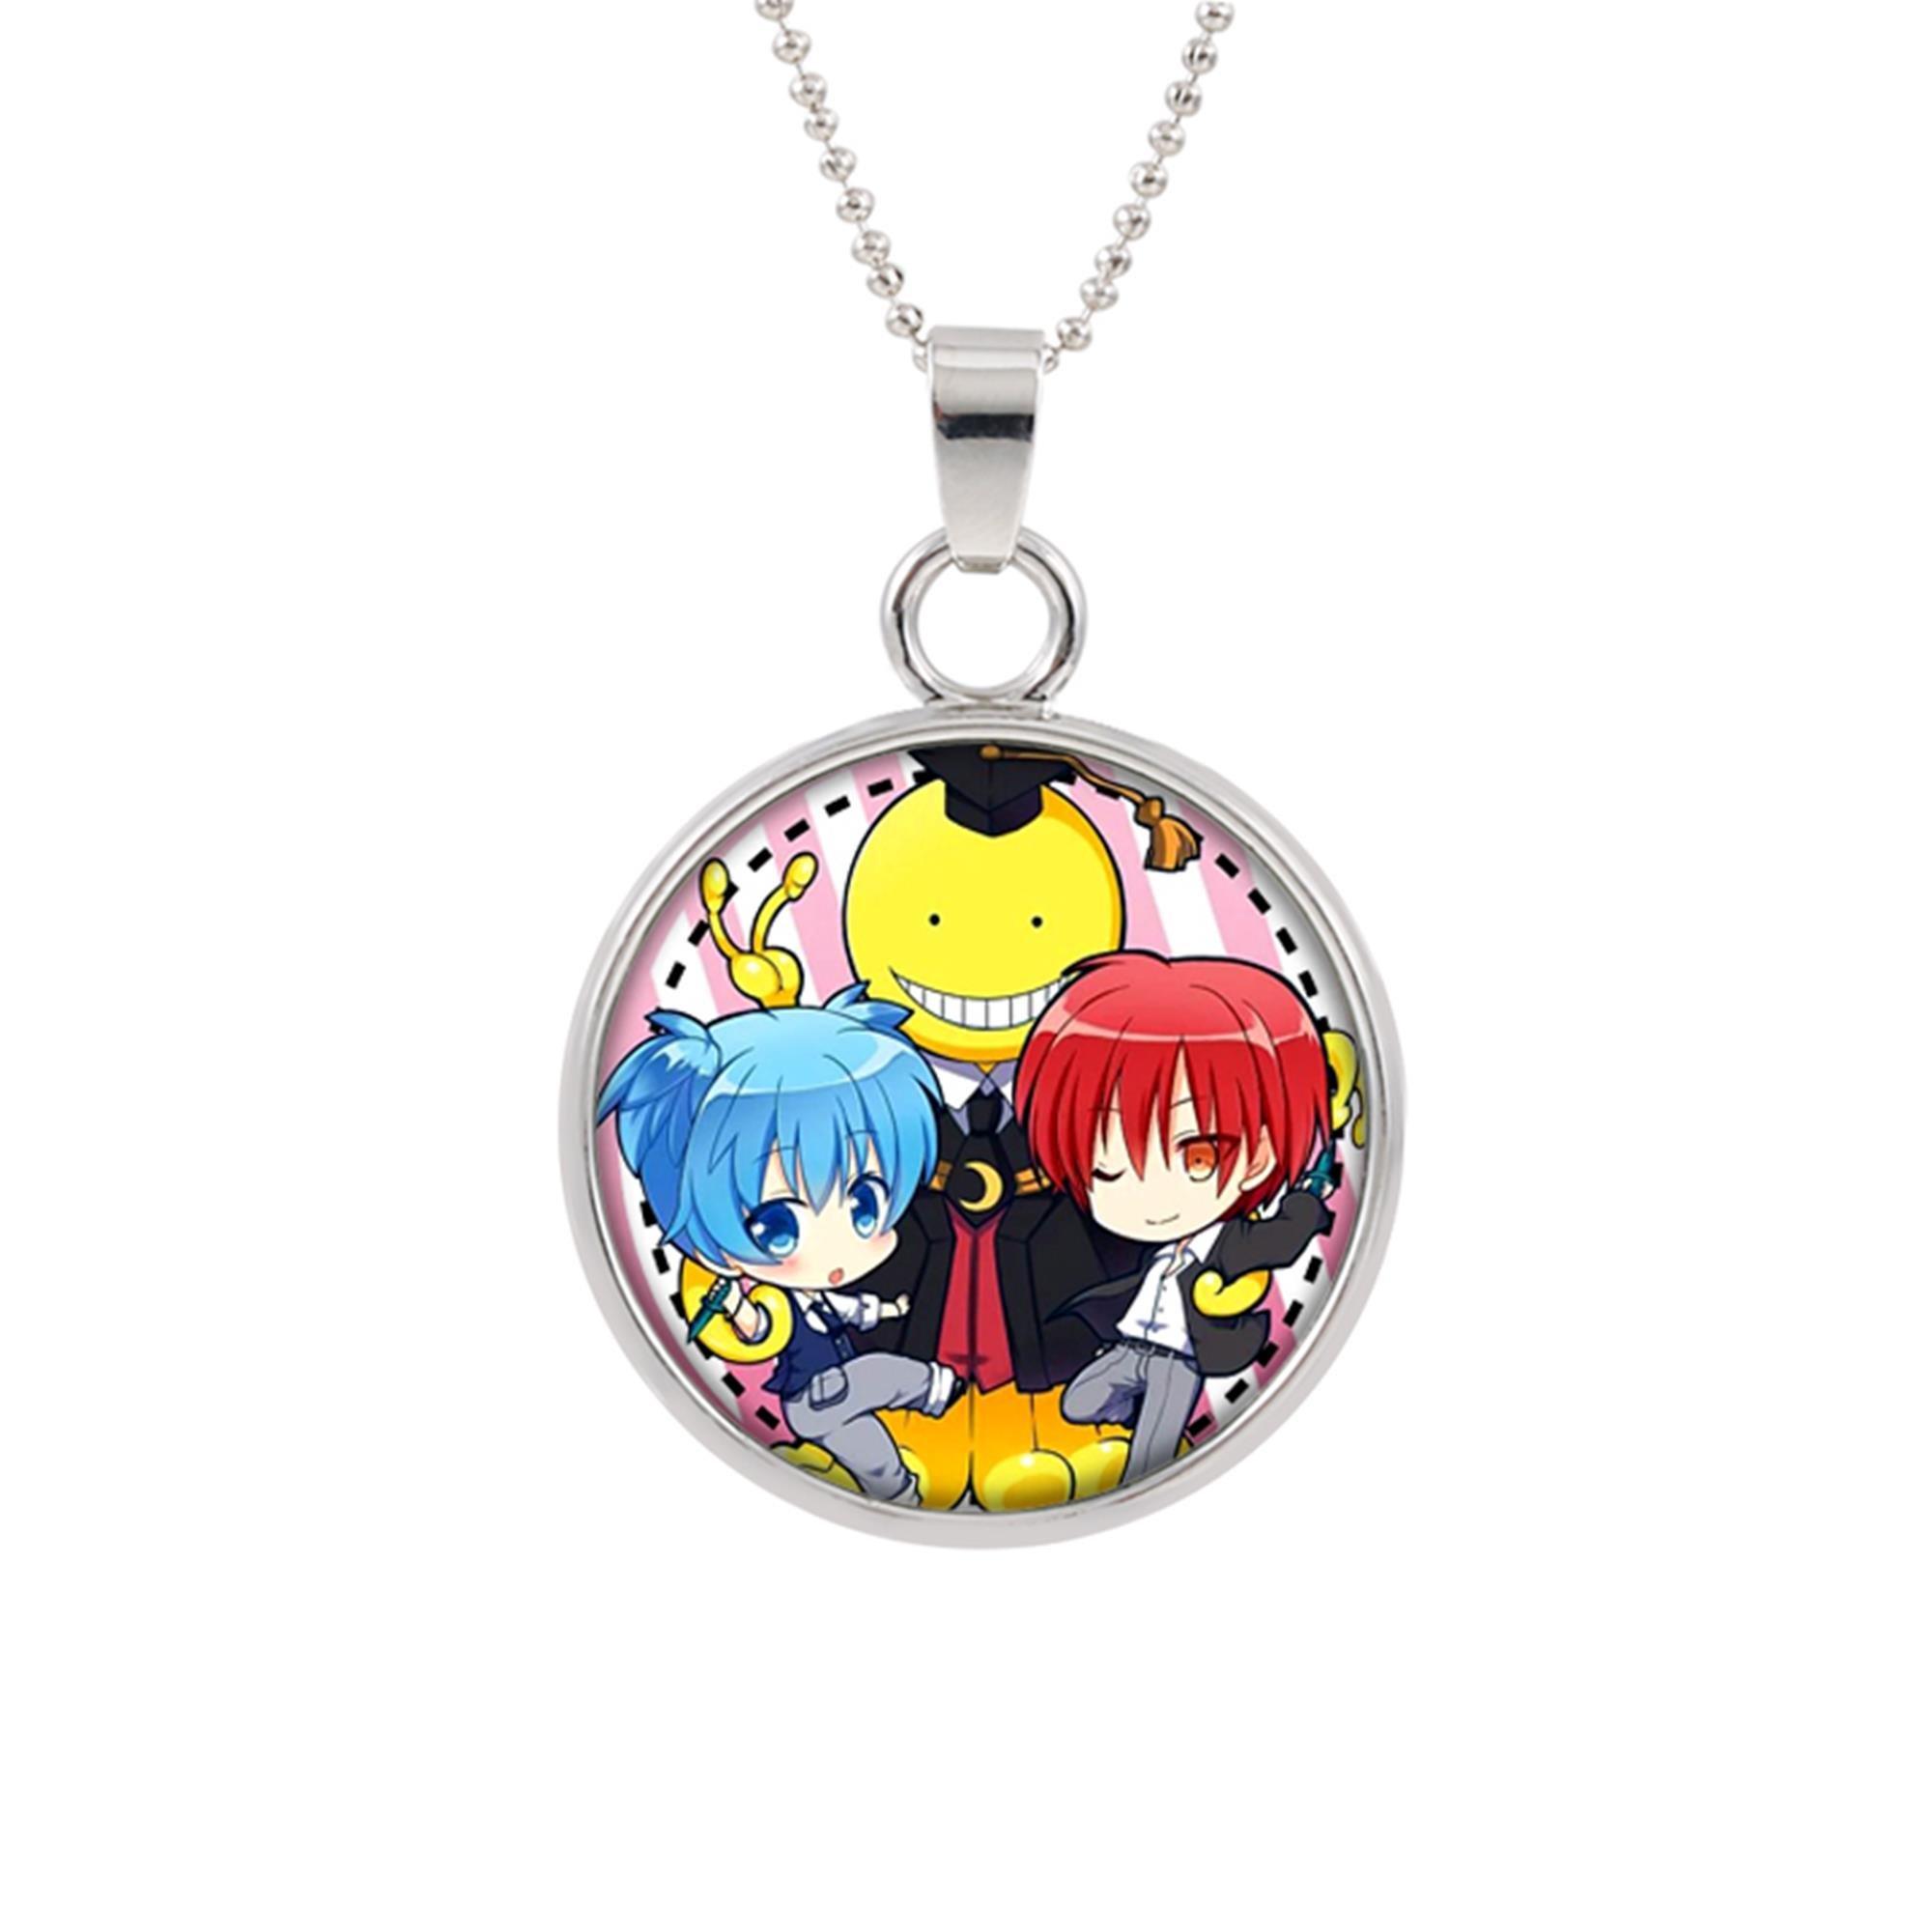 Assassination Classroom Pendant Necklace Anime Manga TV Comics Movies Cartoon Superhero Logo Theme Premium Quality Detailed Cosplay Jewelry Gift Series